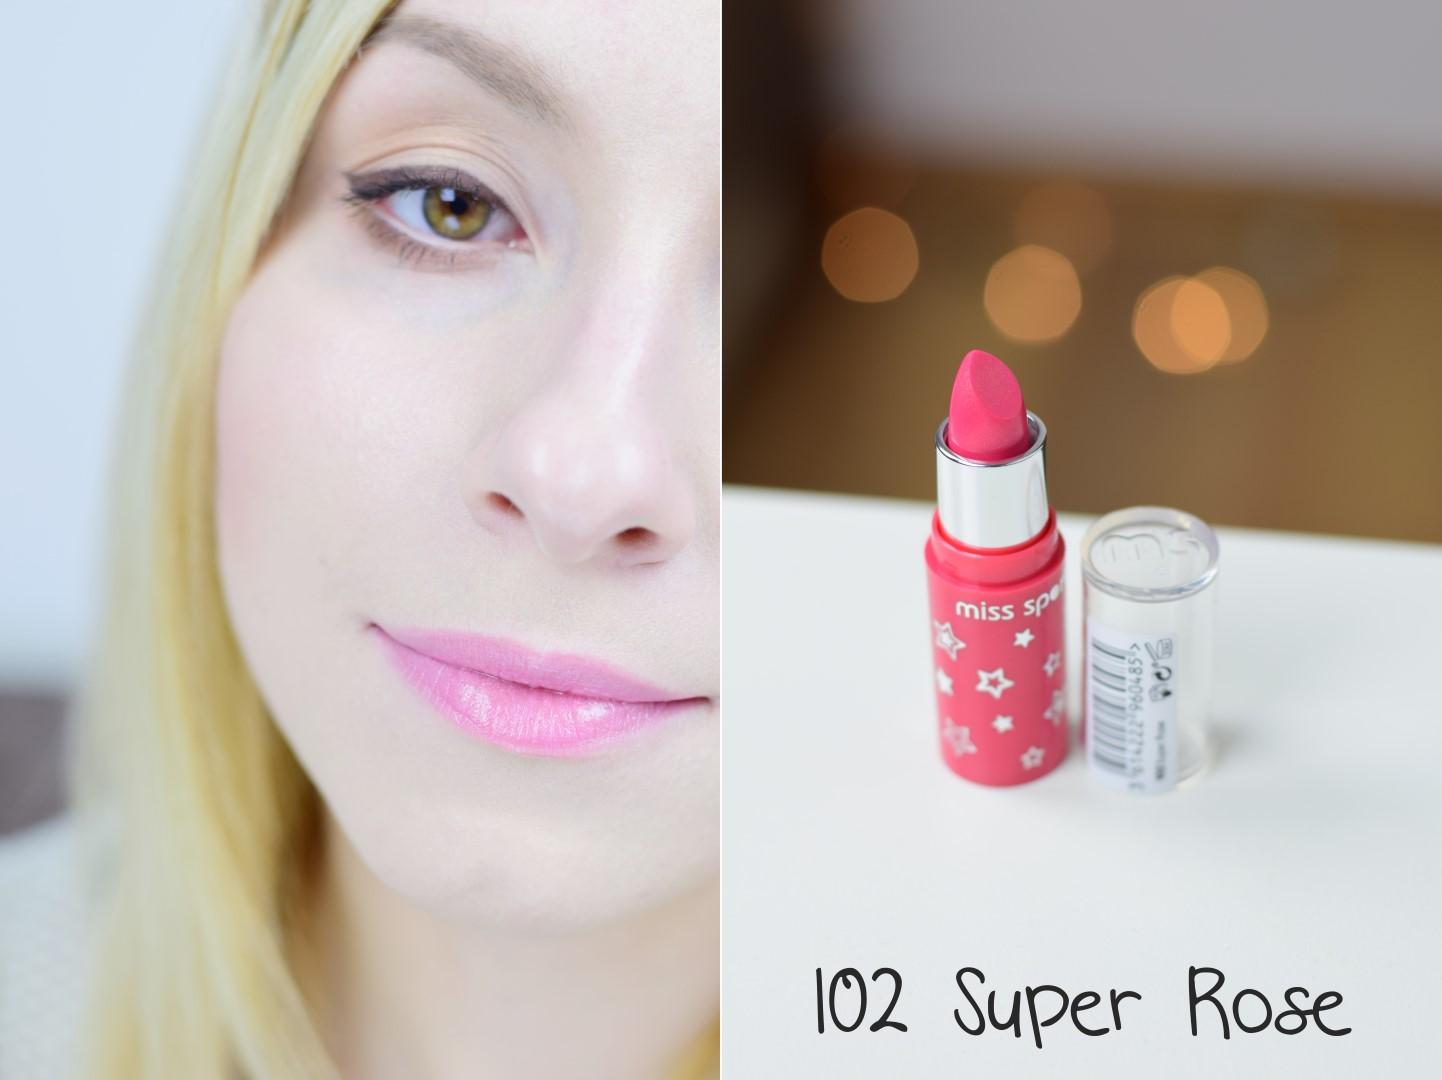 miss_sporty_wonder_smooth_blog_opinia_recenzja_swatche_super_rose_102